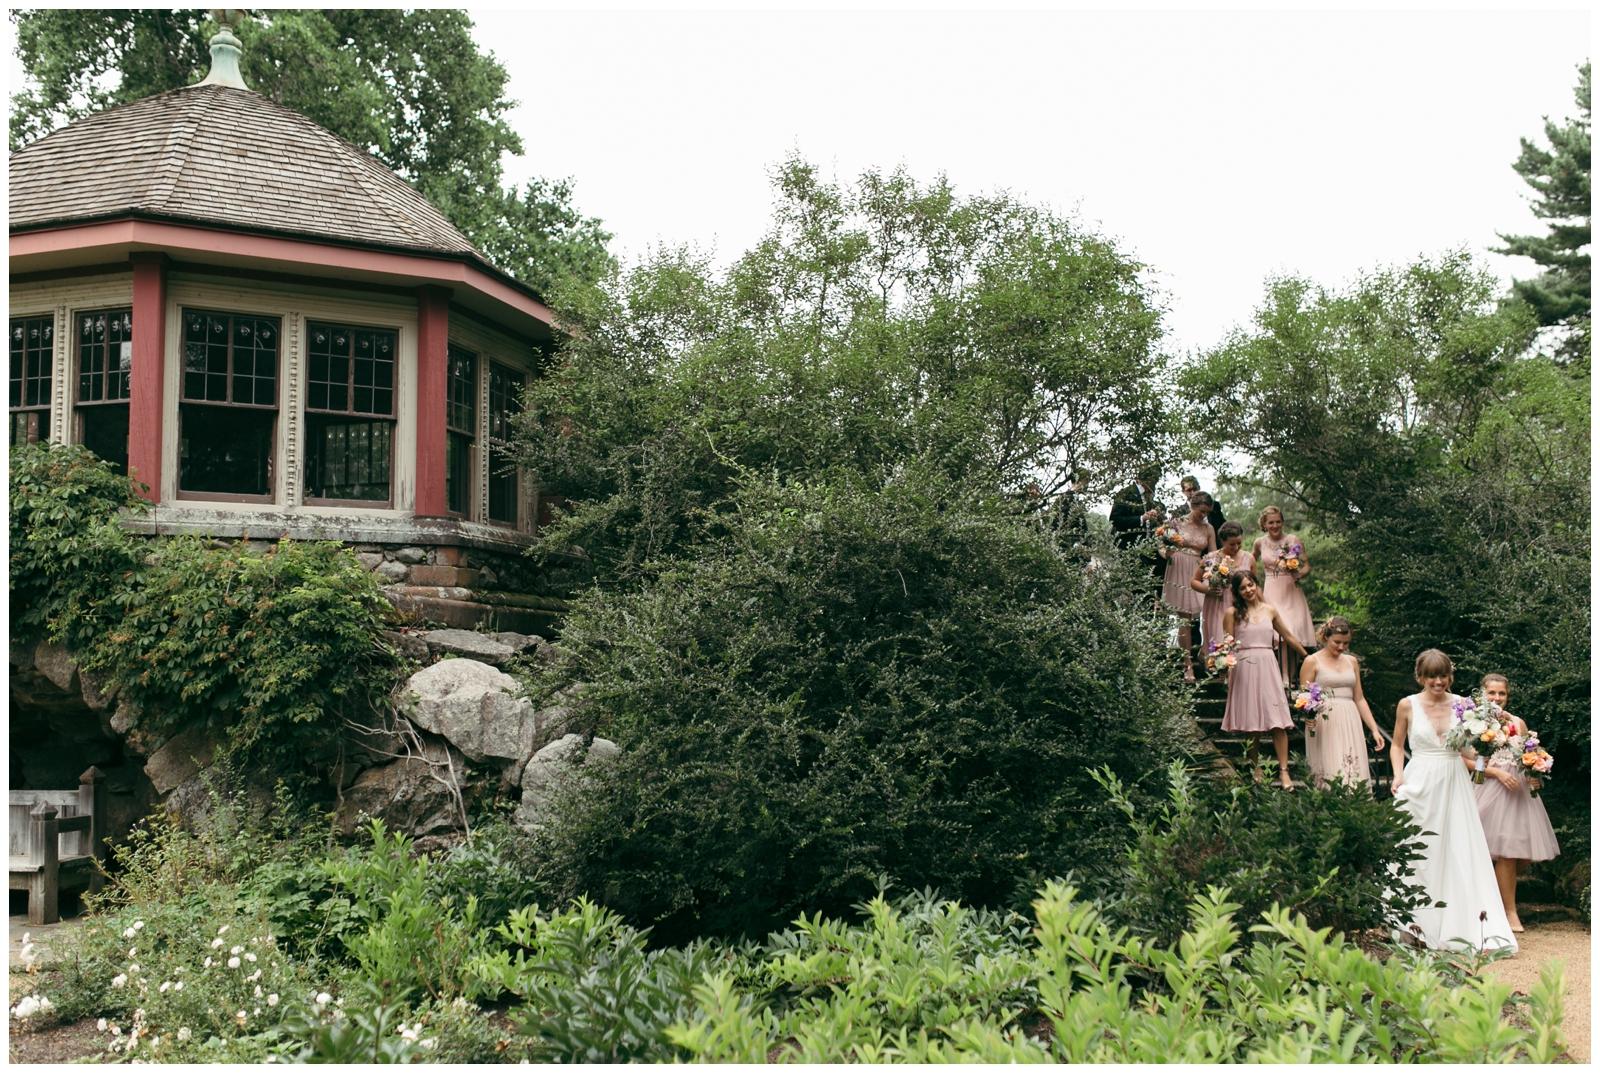 Moraine-Farm-wedding-Bailey-Q-Photo-Massachusetts-wedding-photpgrapher-033.jpg